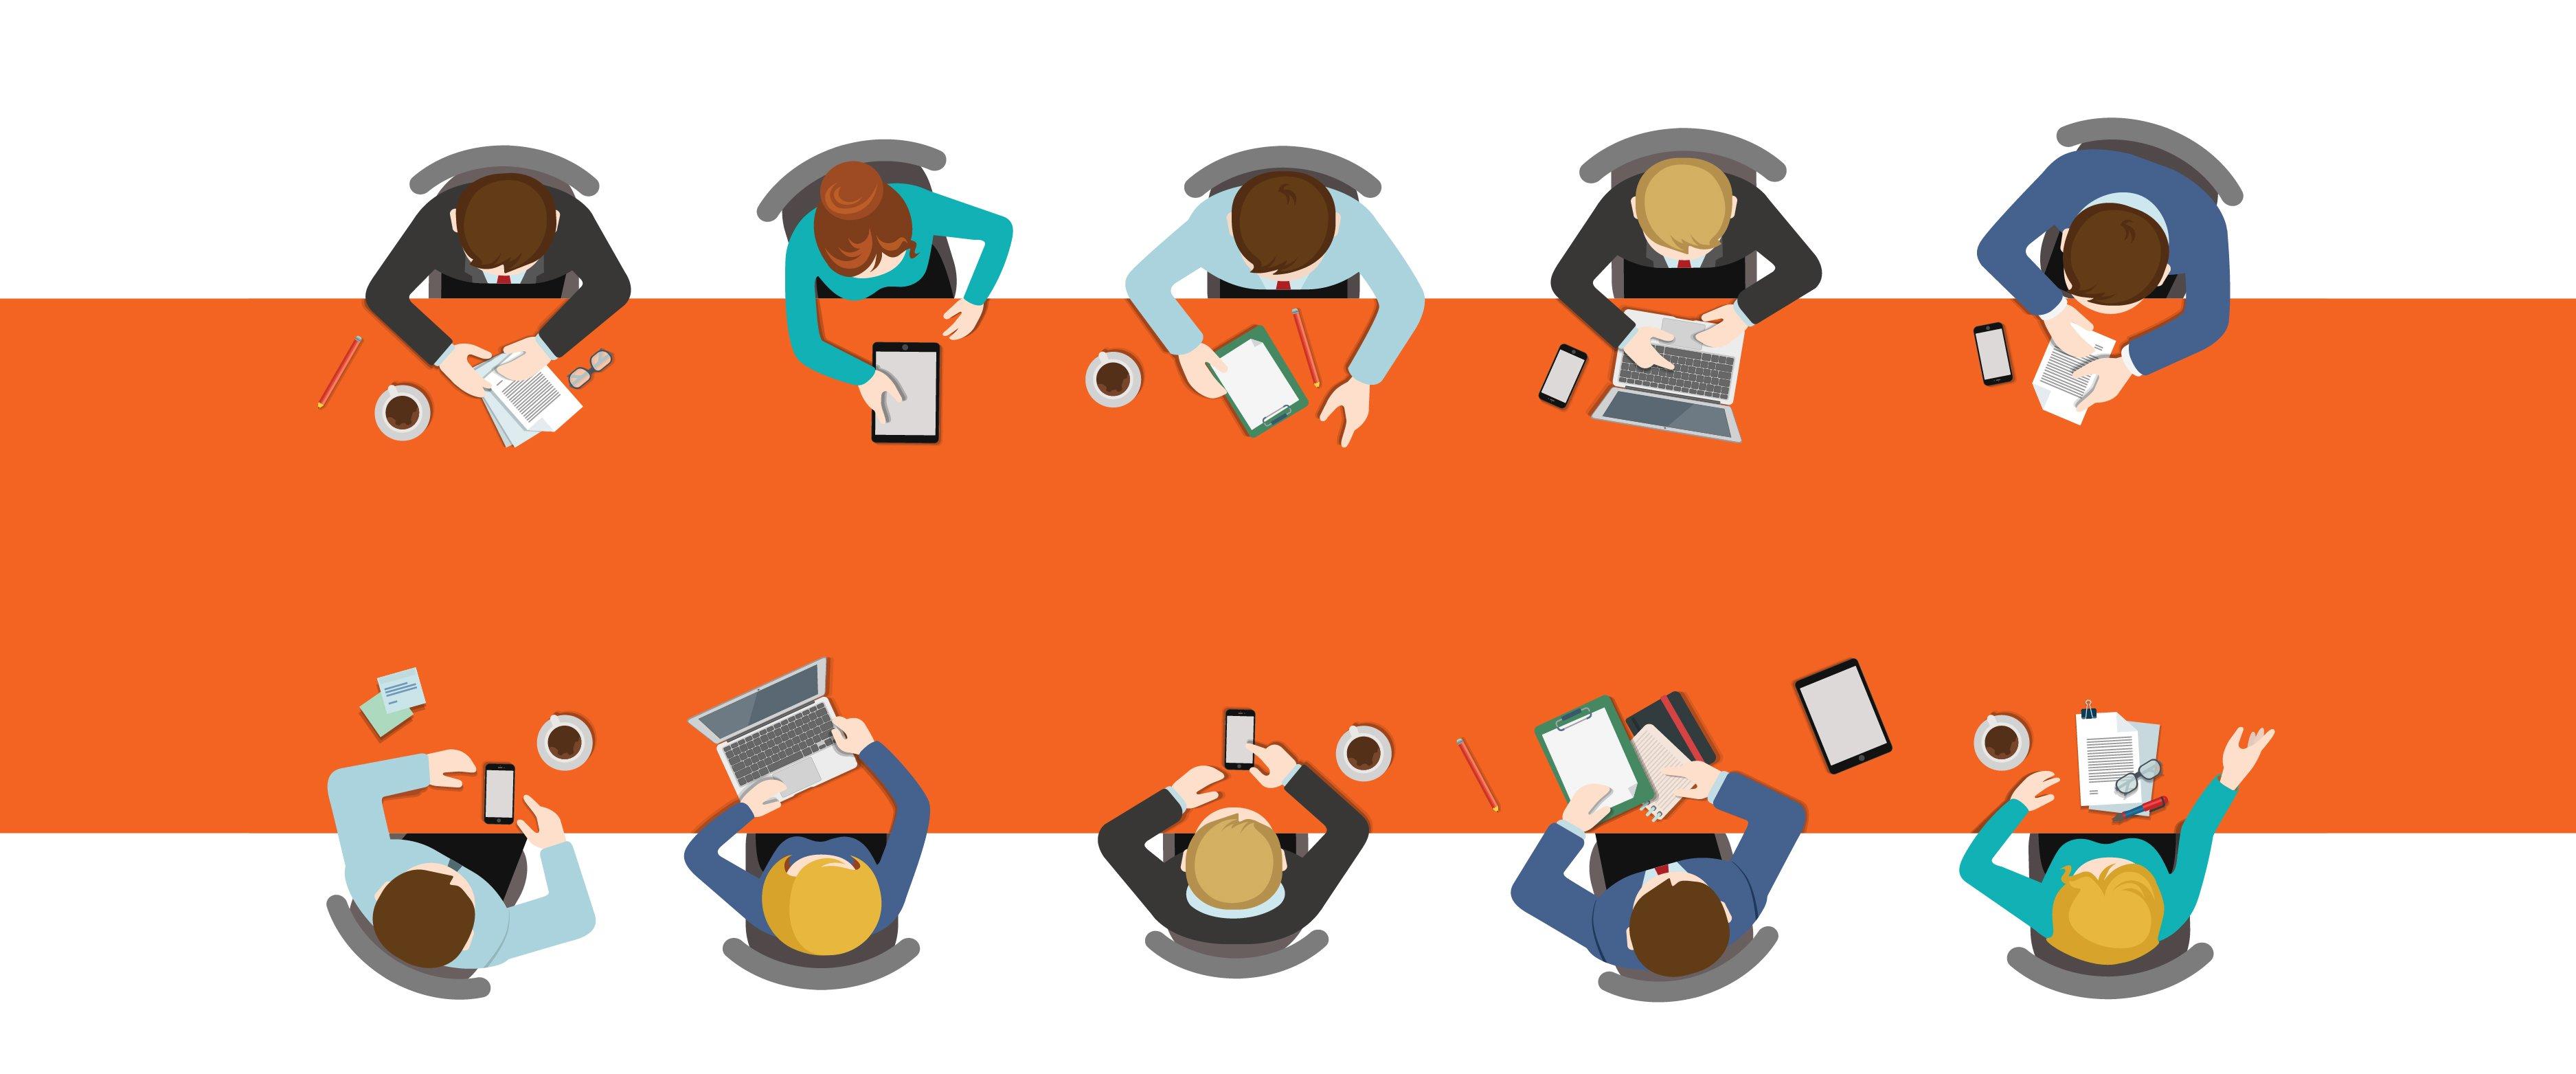 ~_Client Meetings or Phone calls